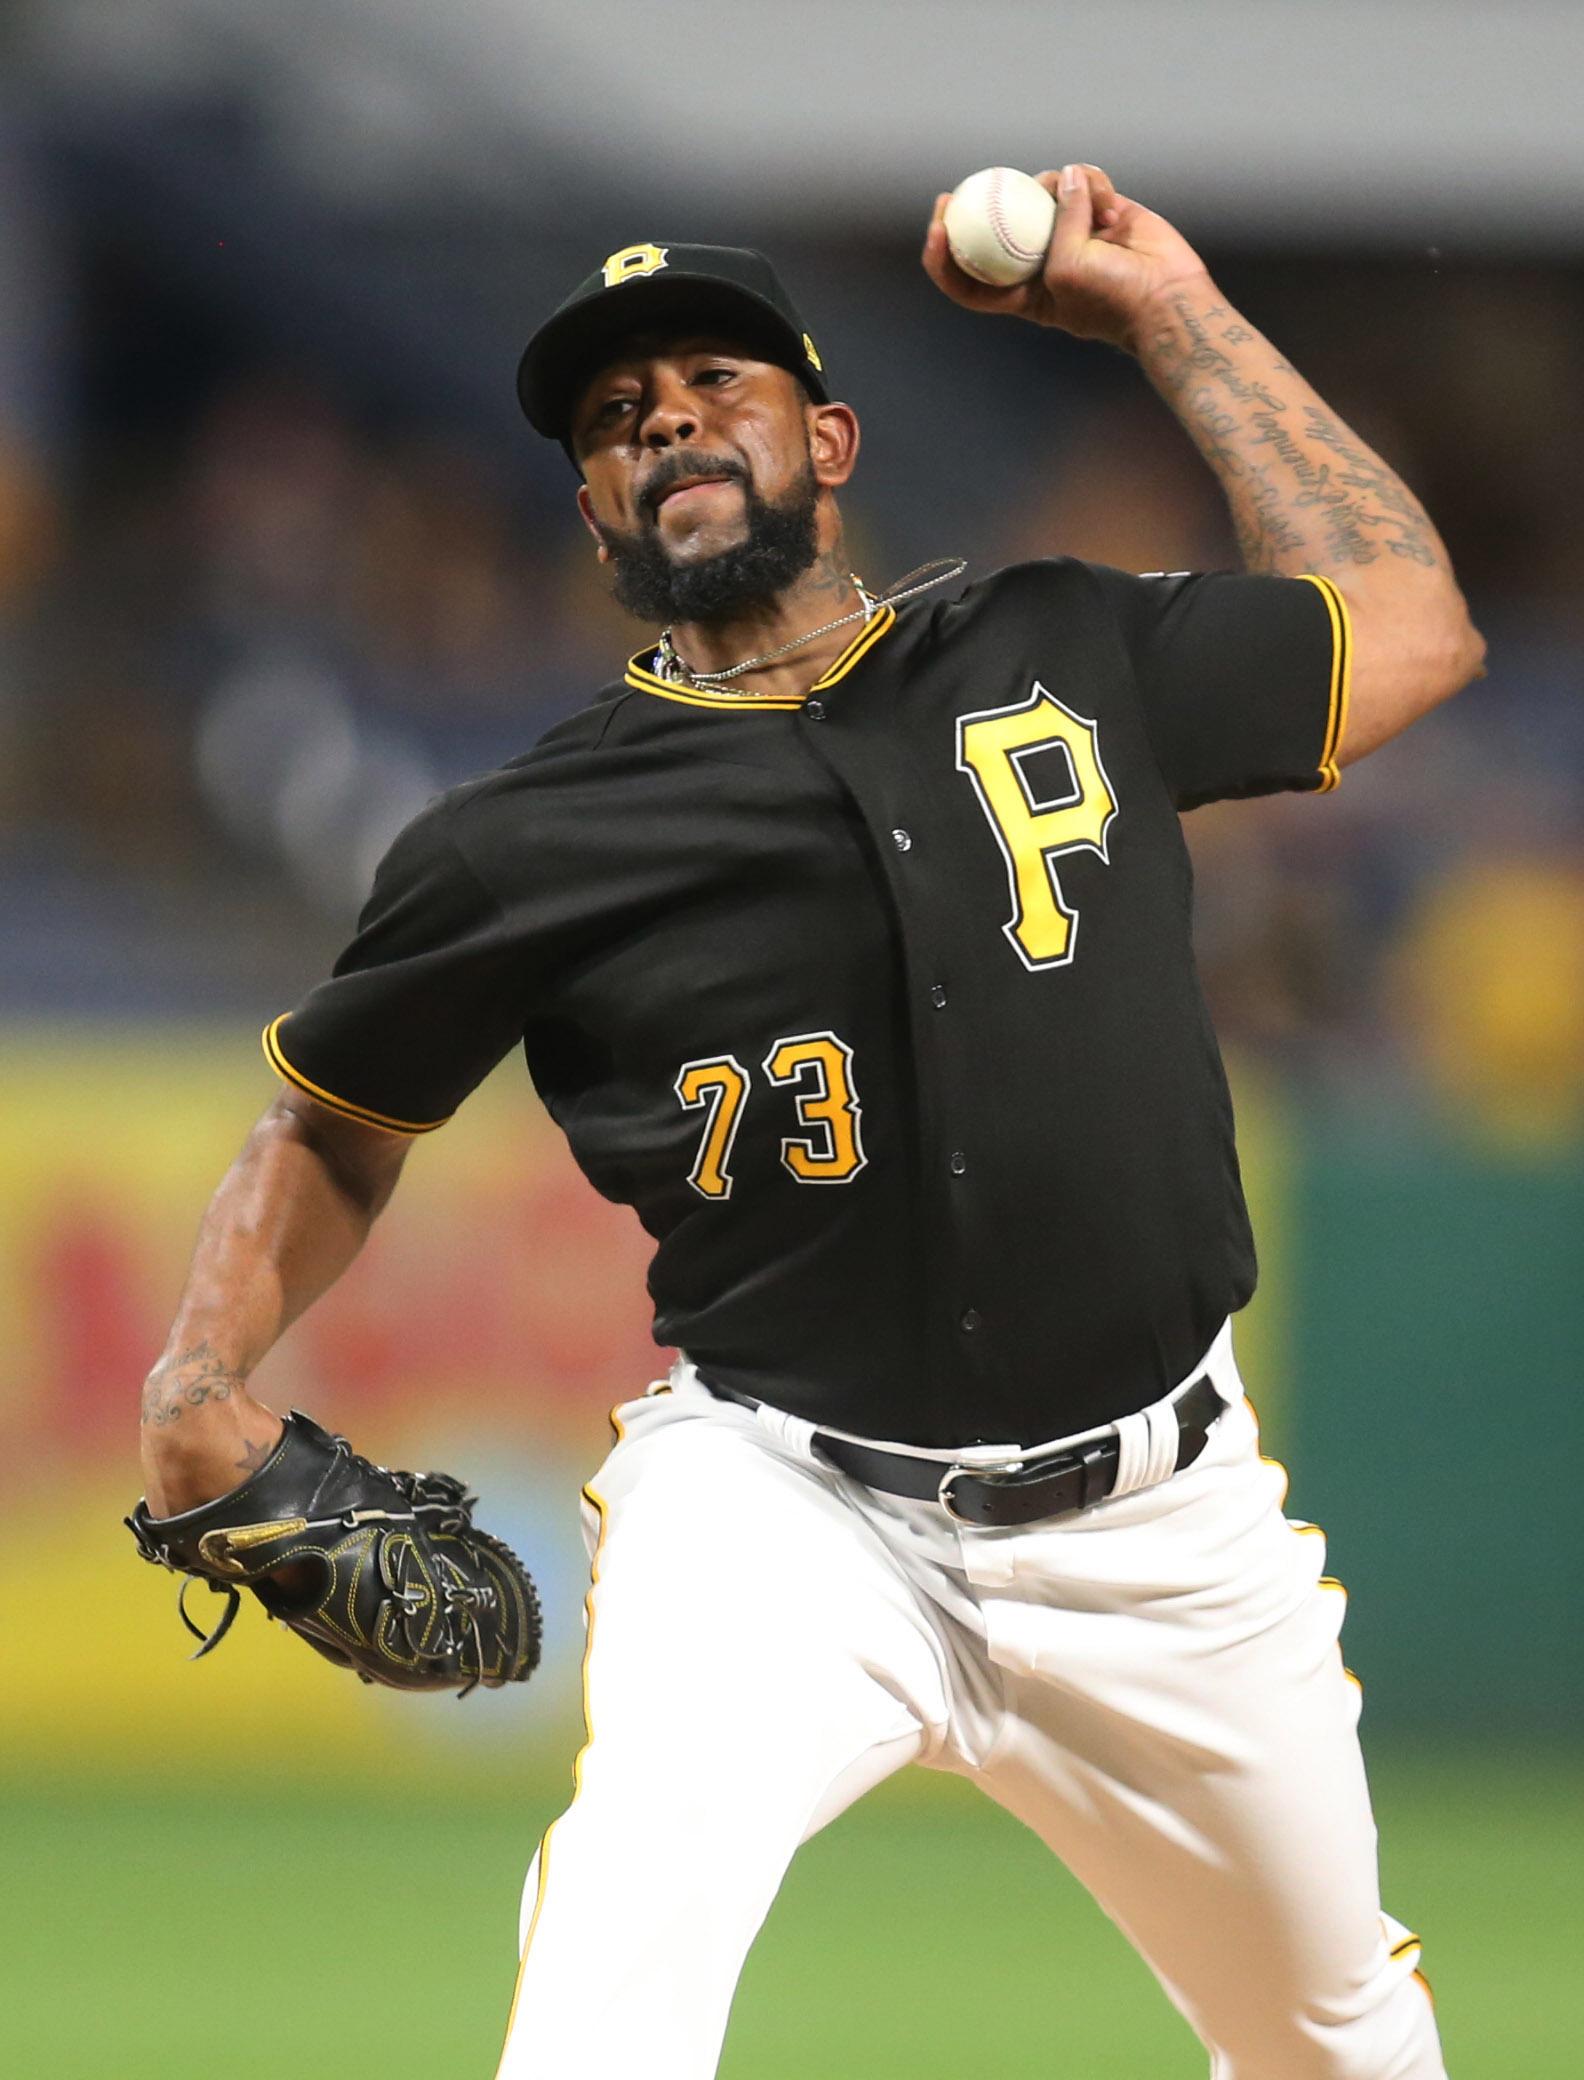 Felipe Rivero Rumors - MLB Trade Rumors Felipe Rivero